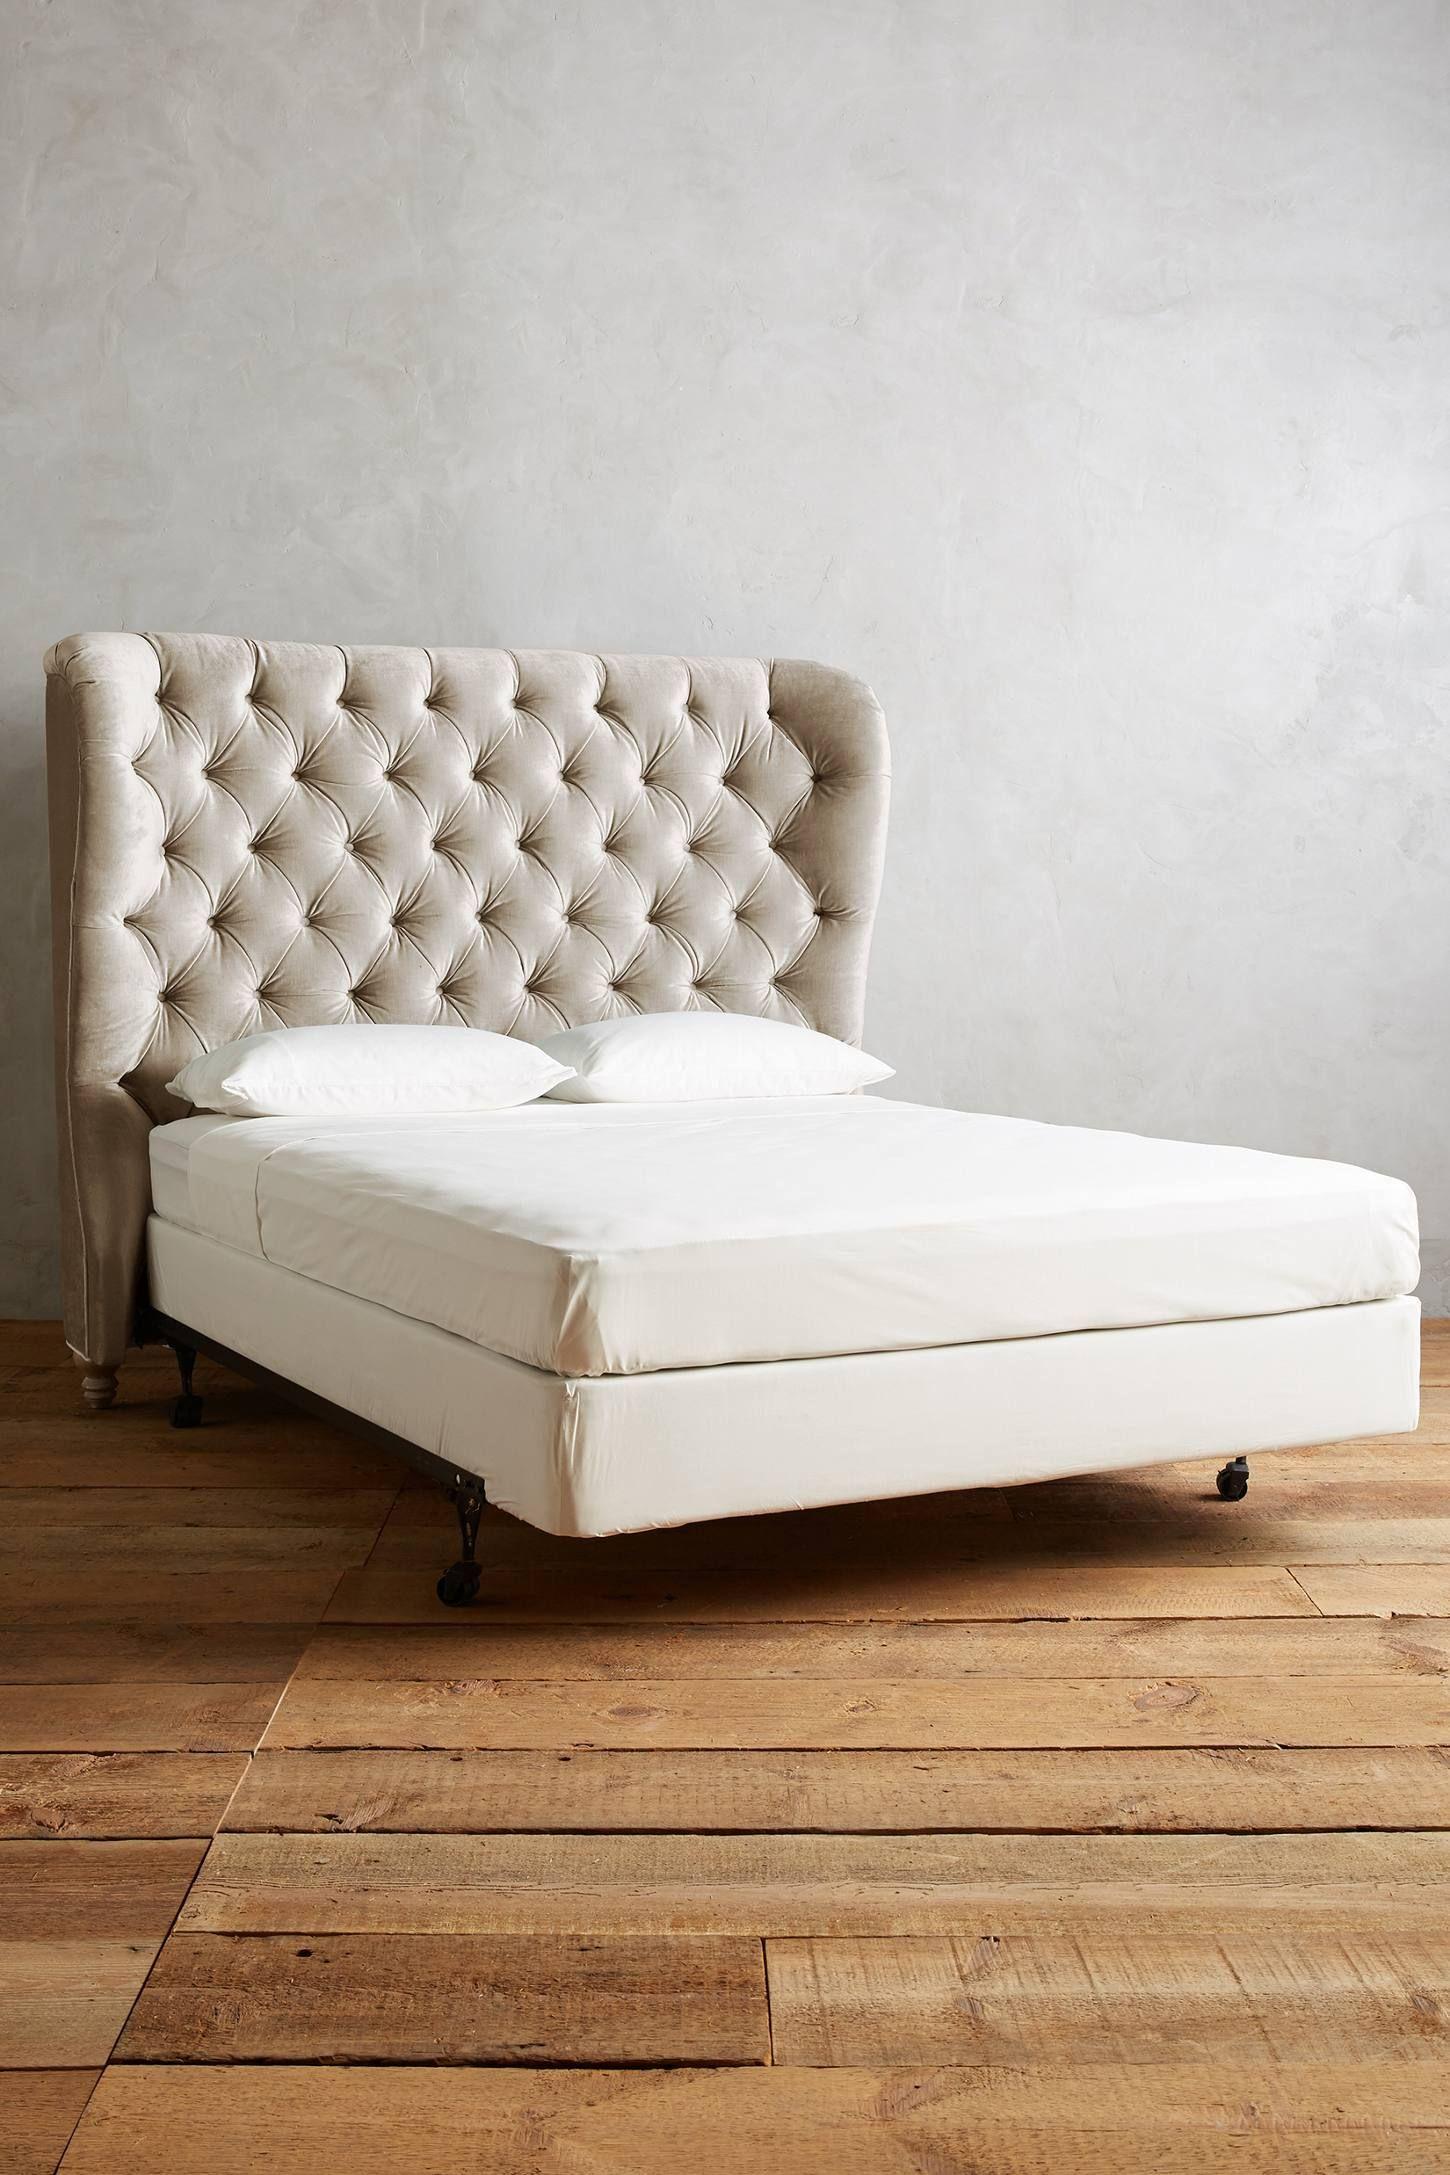 Adjustable Bed Frame Adjustable bed frame, Adjustable